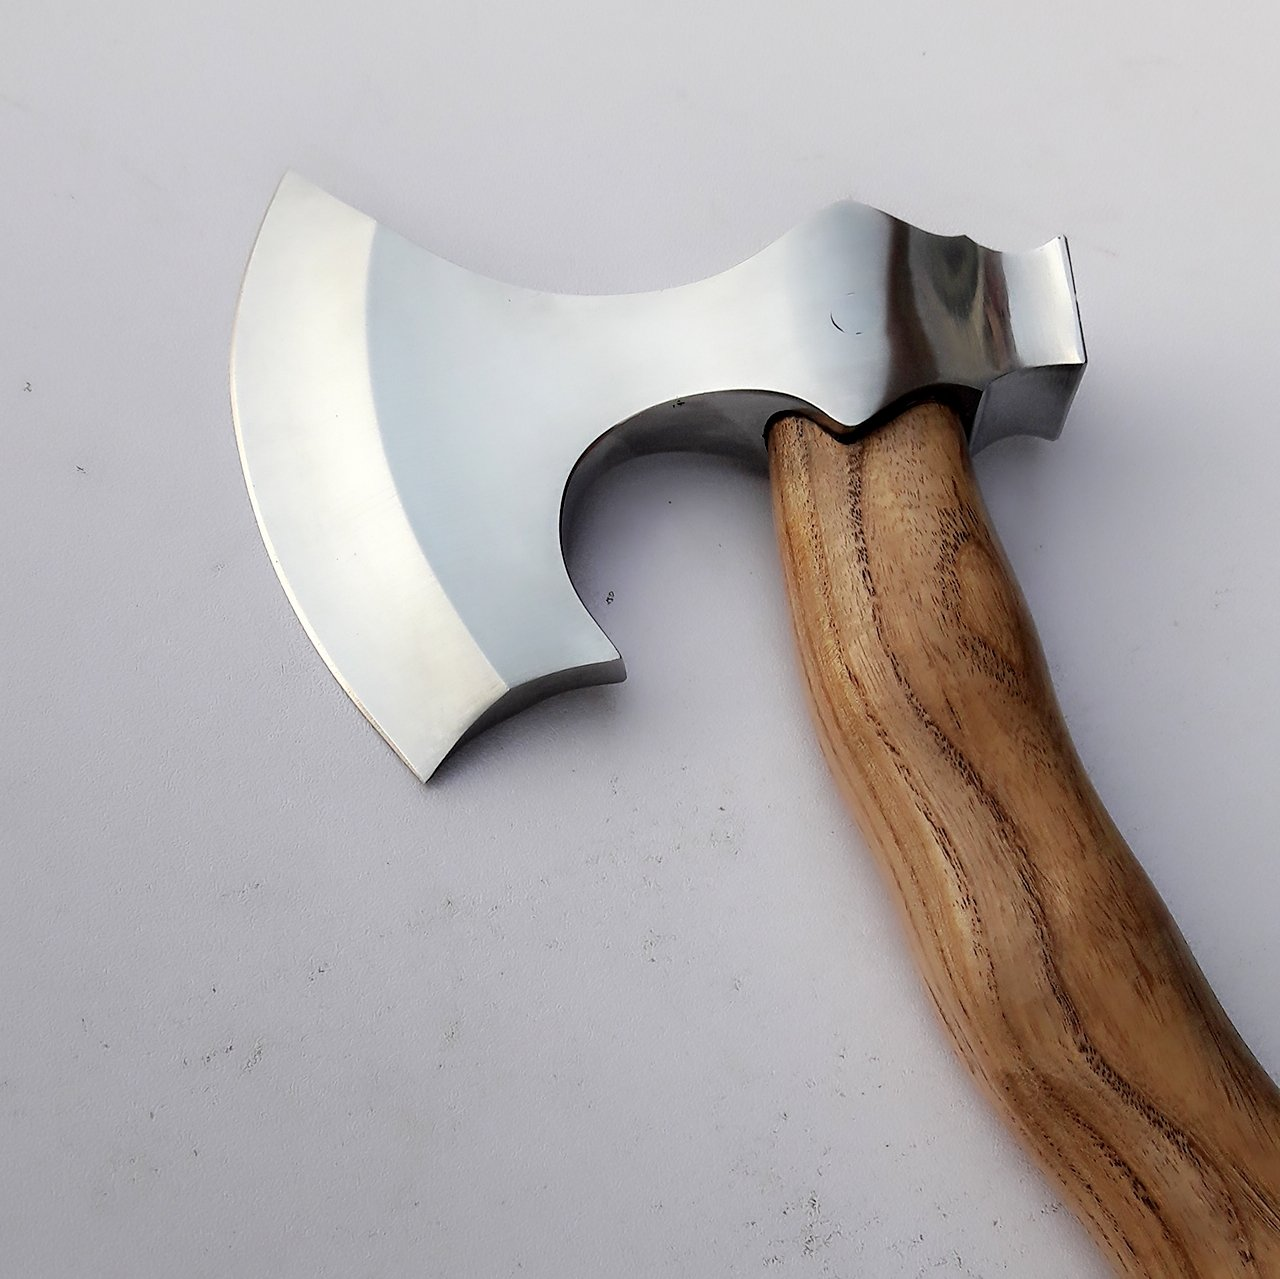 Amazon.com: MDM personalizado hecho a mano Tomahawk Viking ...